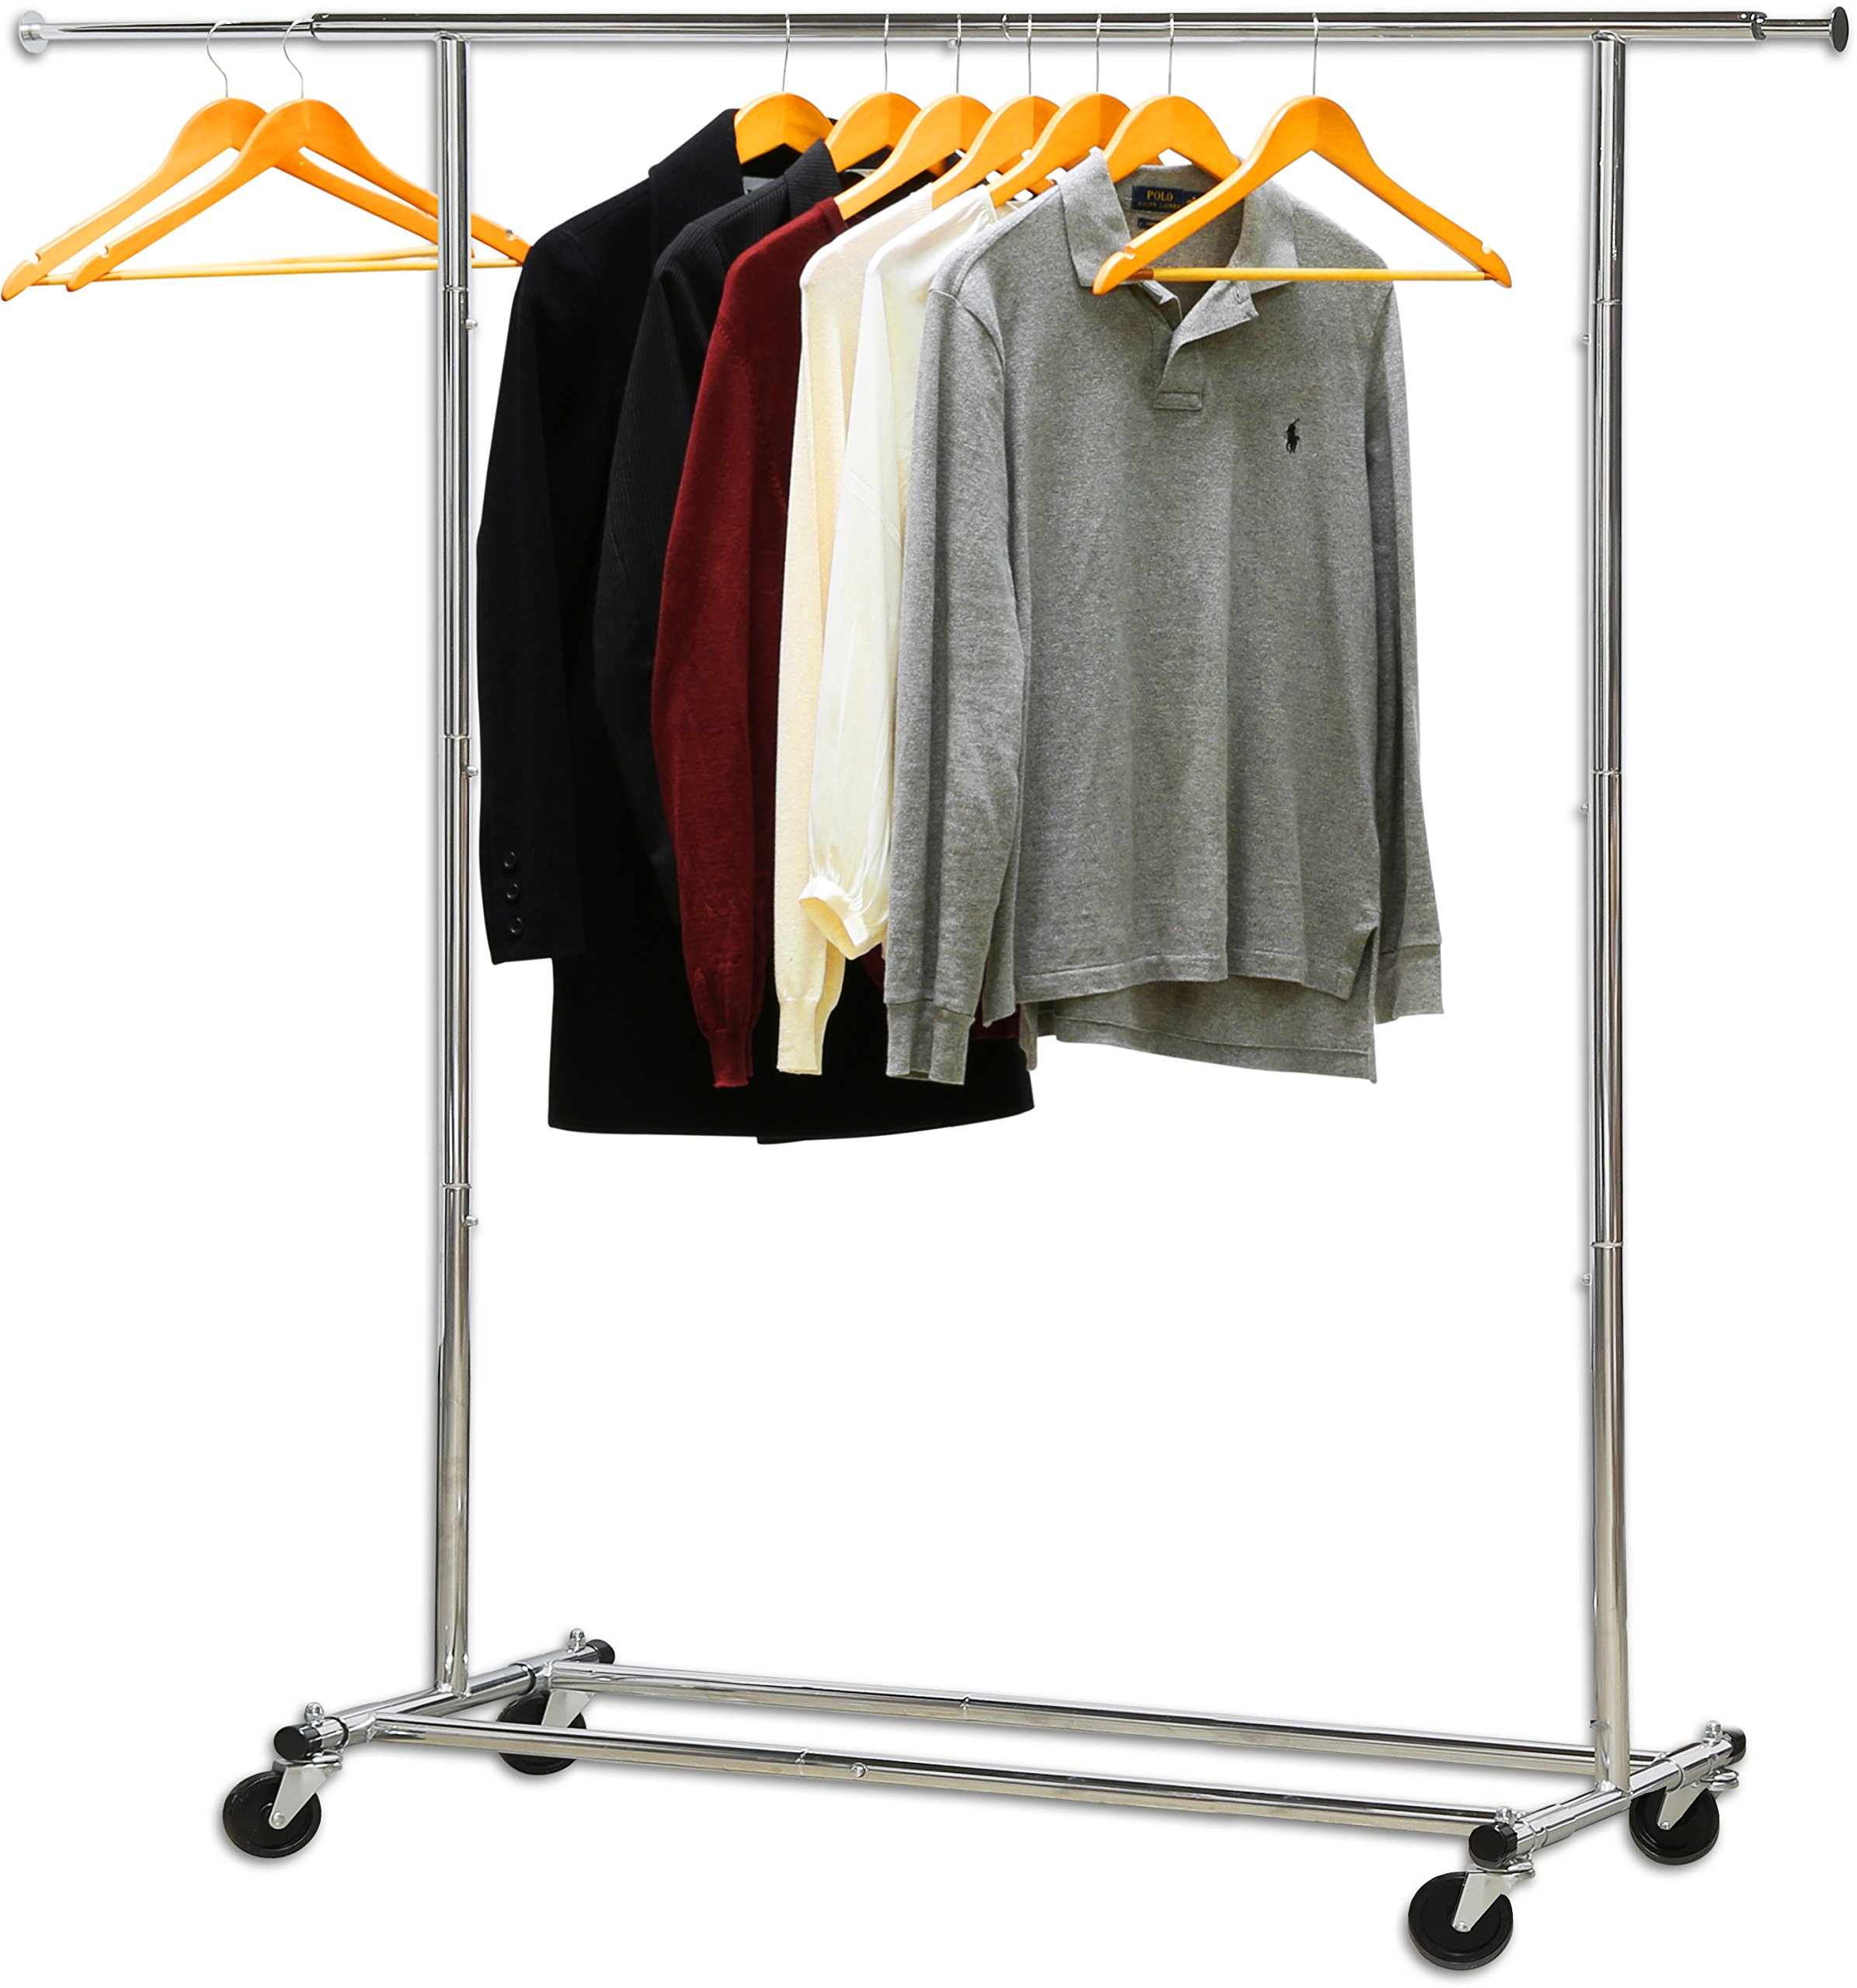 Simple Houseware Heavy Duty Clothing Garment Rack, Chrome by Simple Houseware